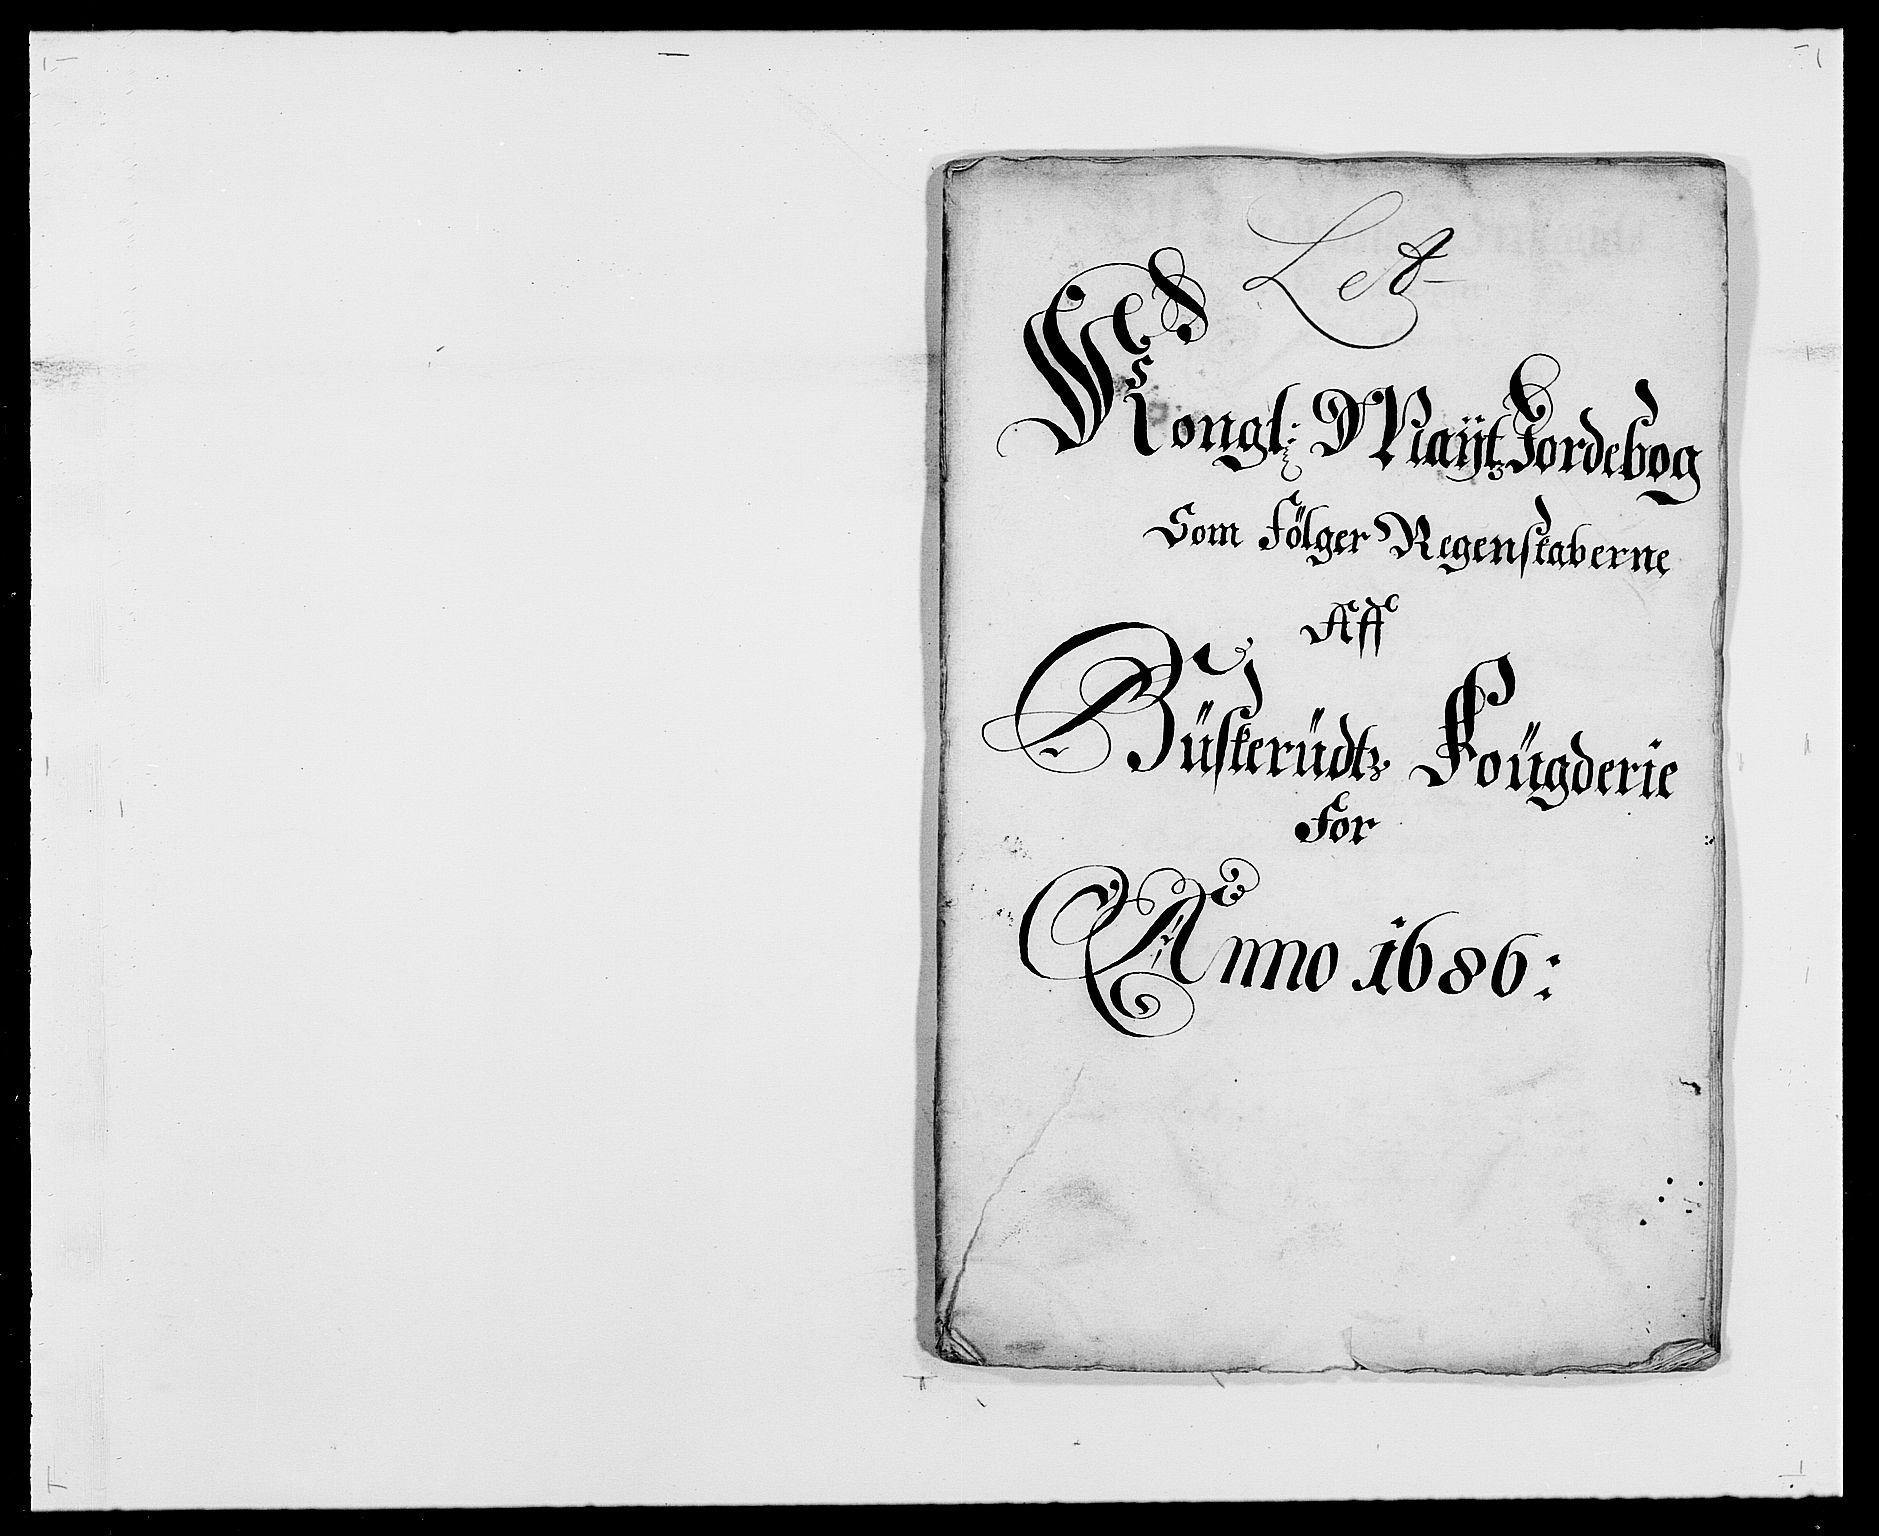 RA, Rentekammeret inntil 1814, Reviderte regnskaper, Fogderegnskap, R25/L1678: Fogderegnskap Buskerud, 1685-1686, s. 228